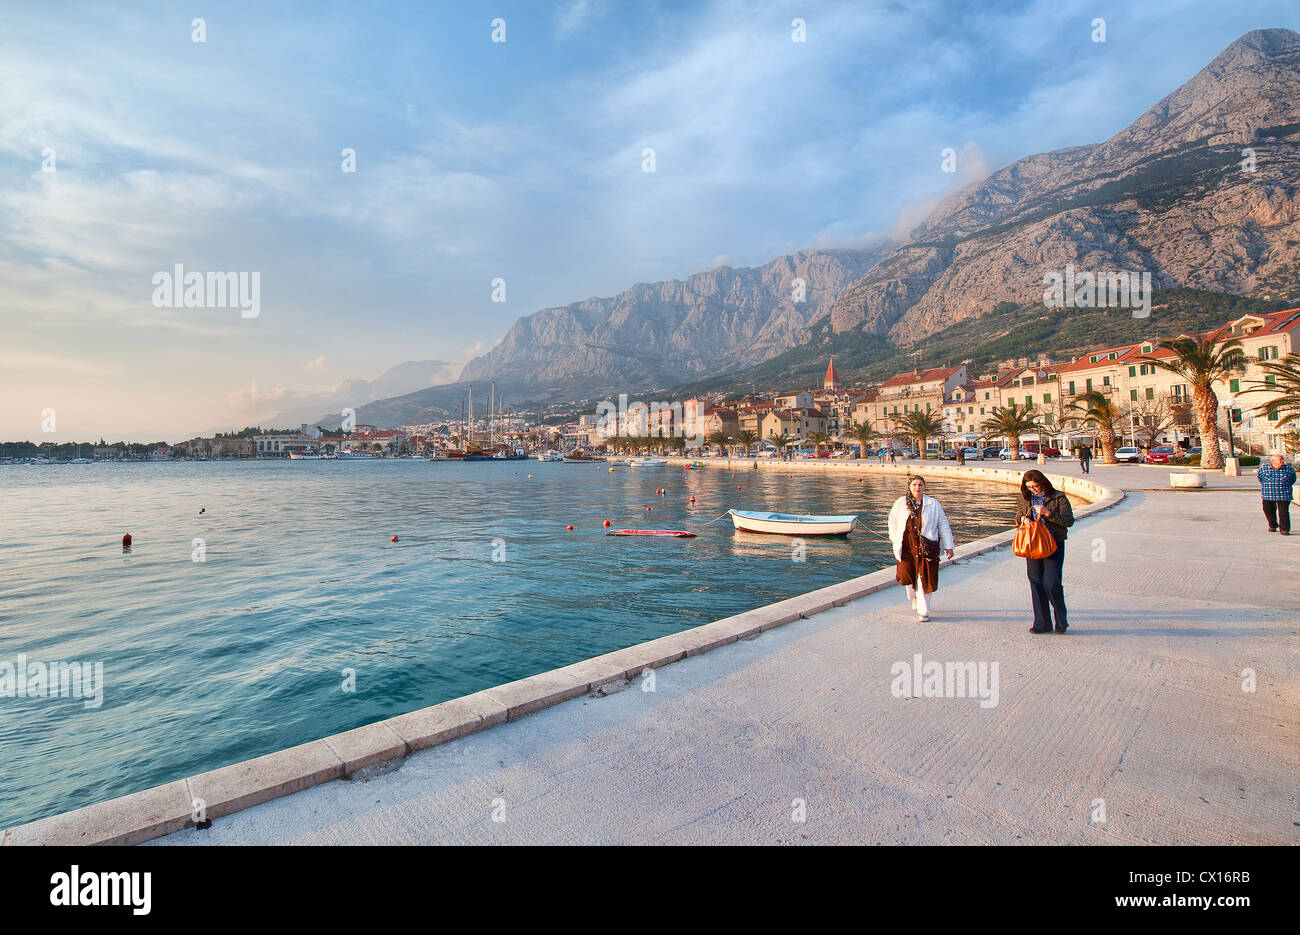 Evening time in the Croatian city of Makarska on the Adriatic Coast Stock Photo